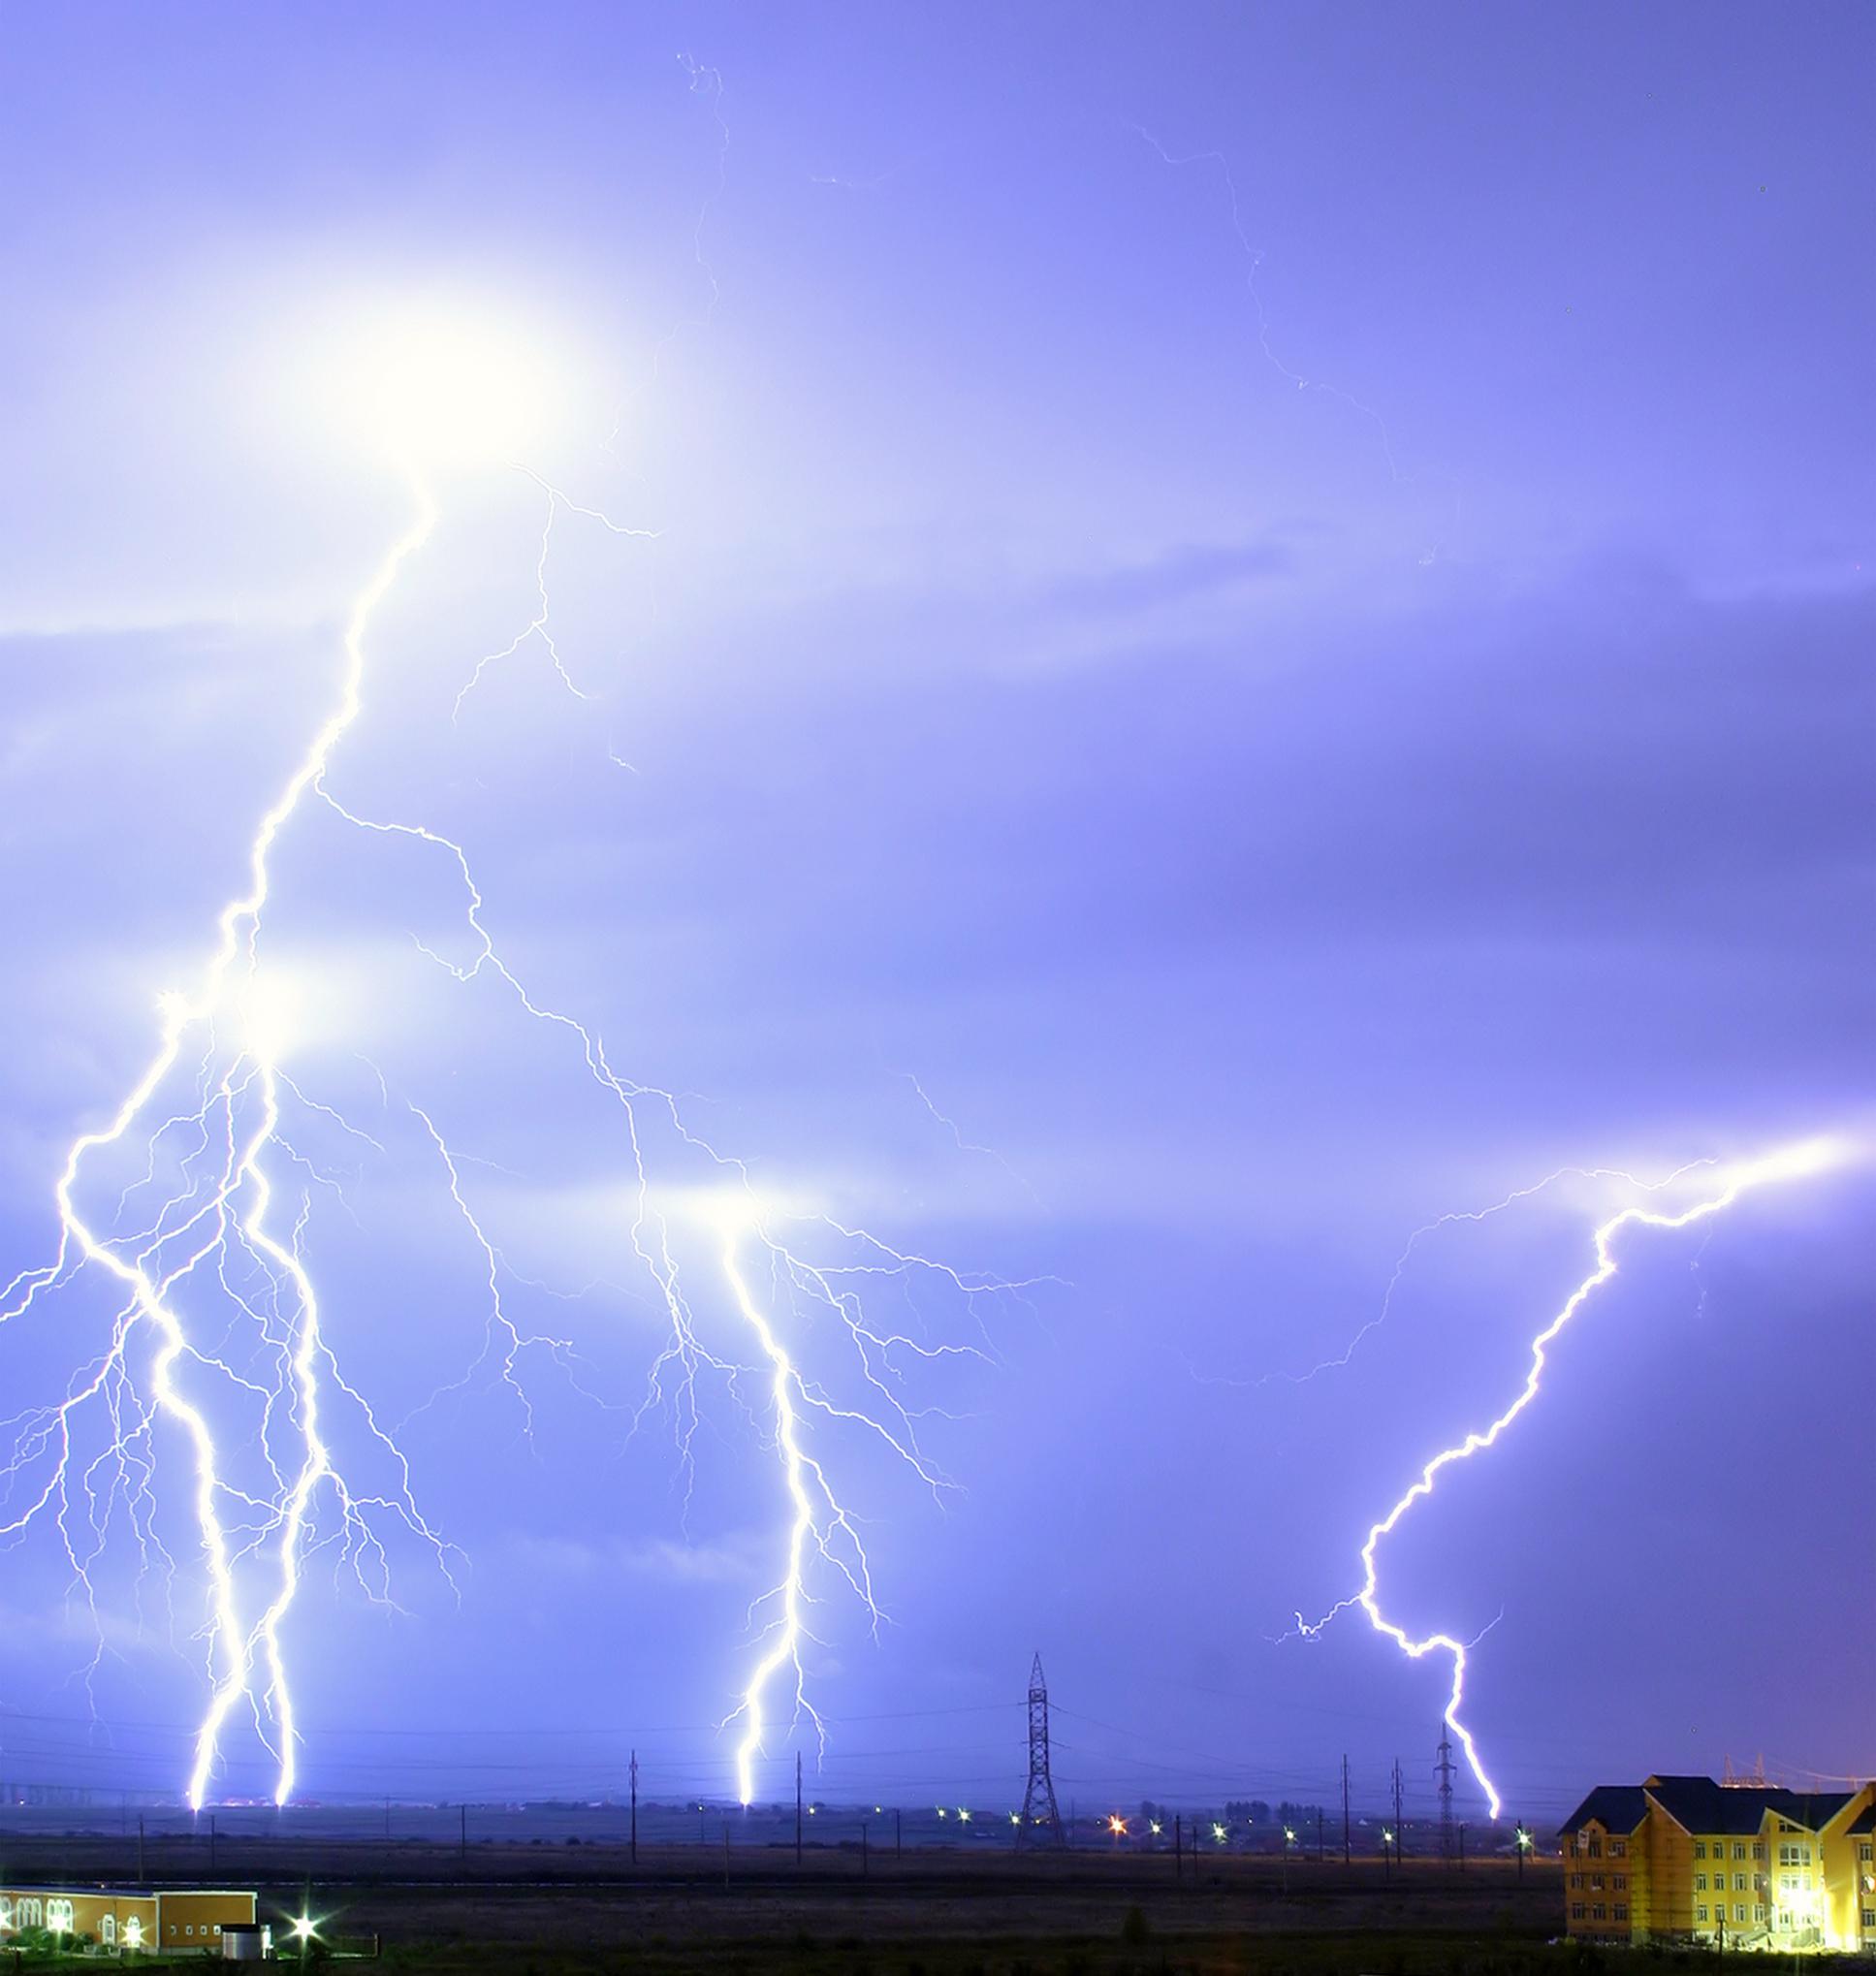 https://upload.wikimedia.org/wikipedia/commons/d/db/Lightning_over_Oradea_Romania_cropped.jpg